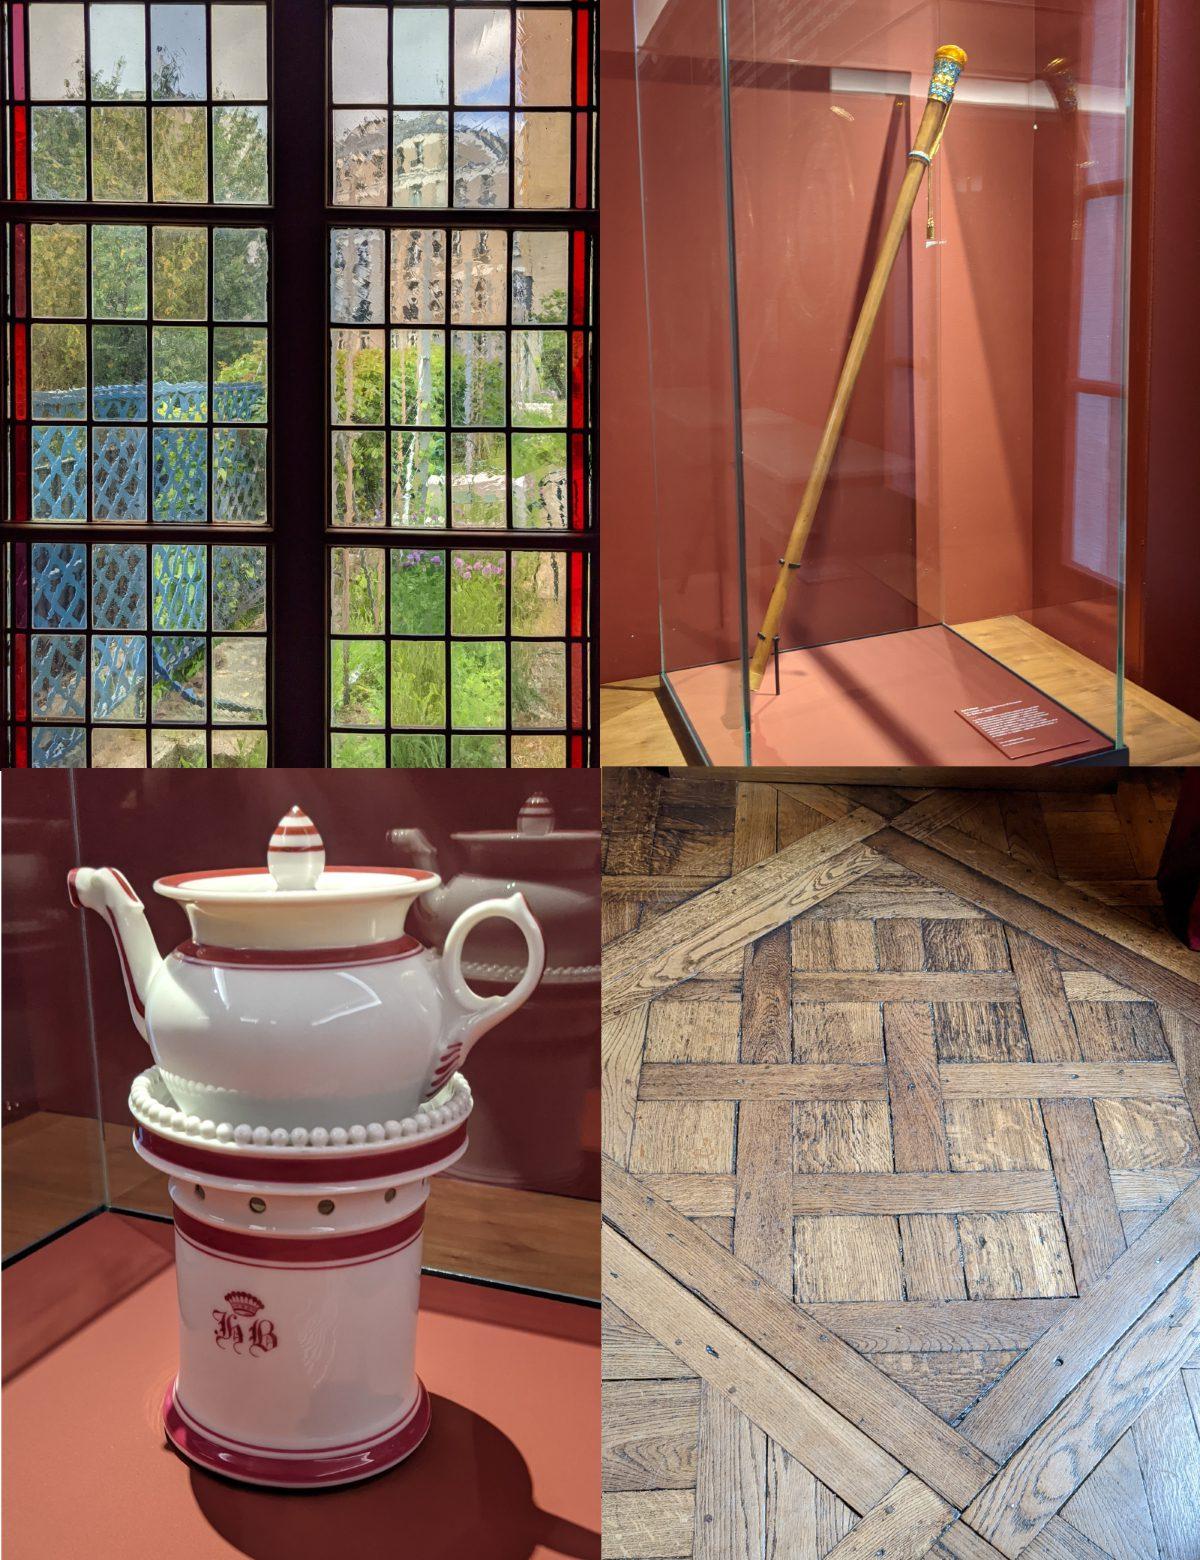 Mosaic of Balzac's house items